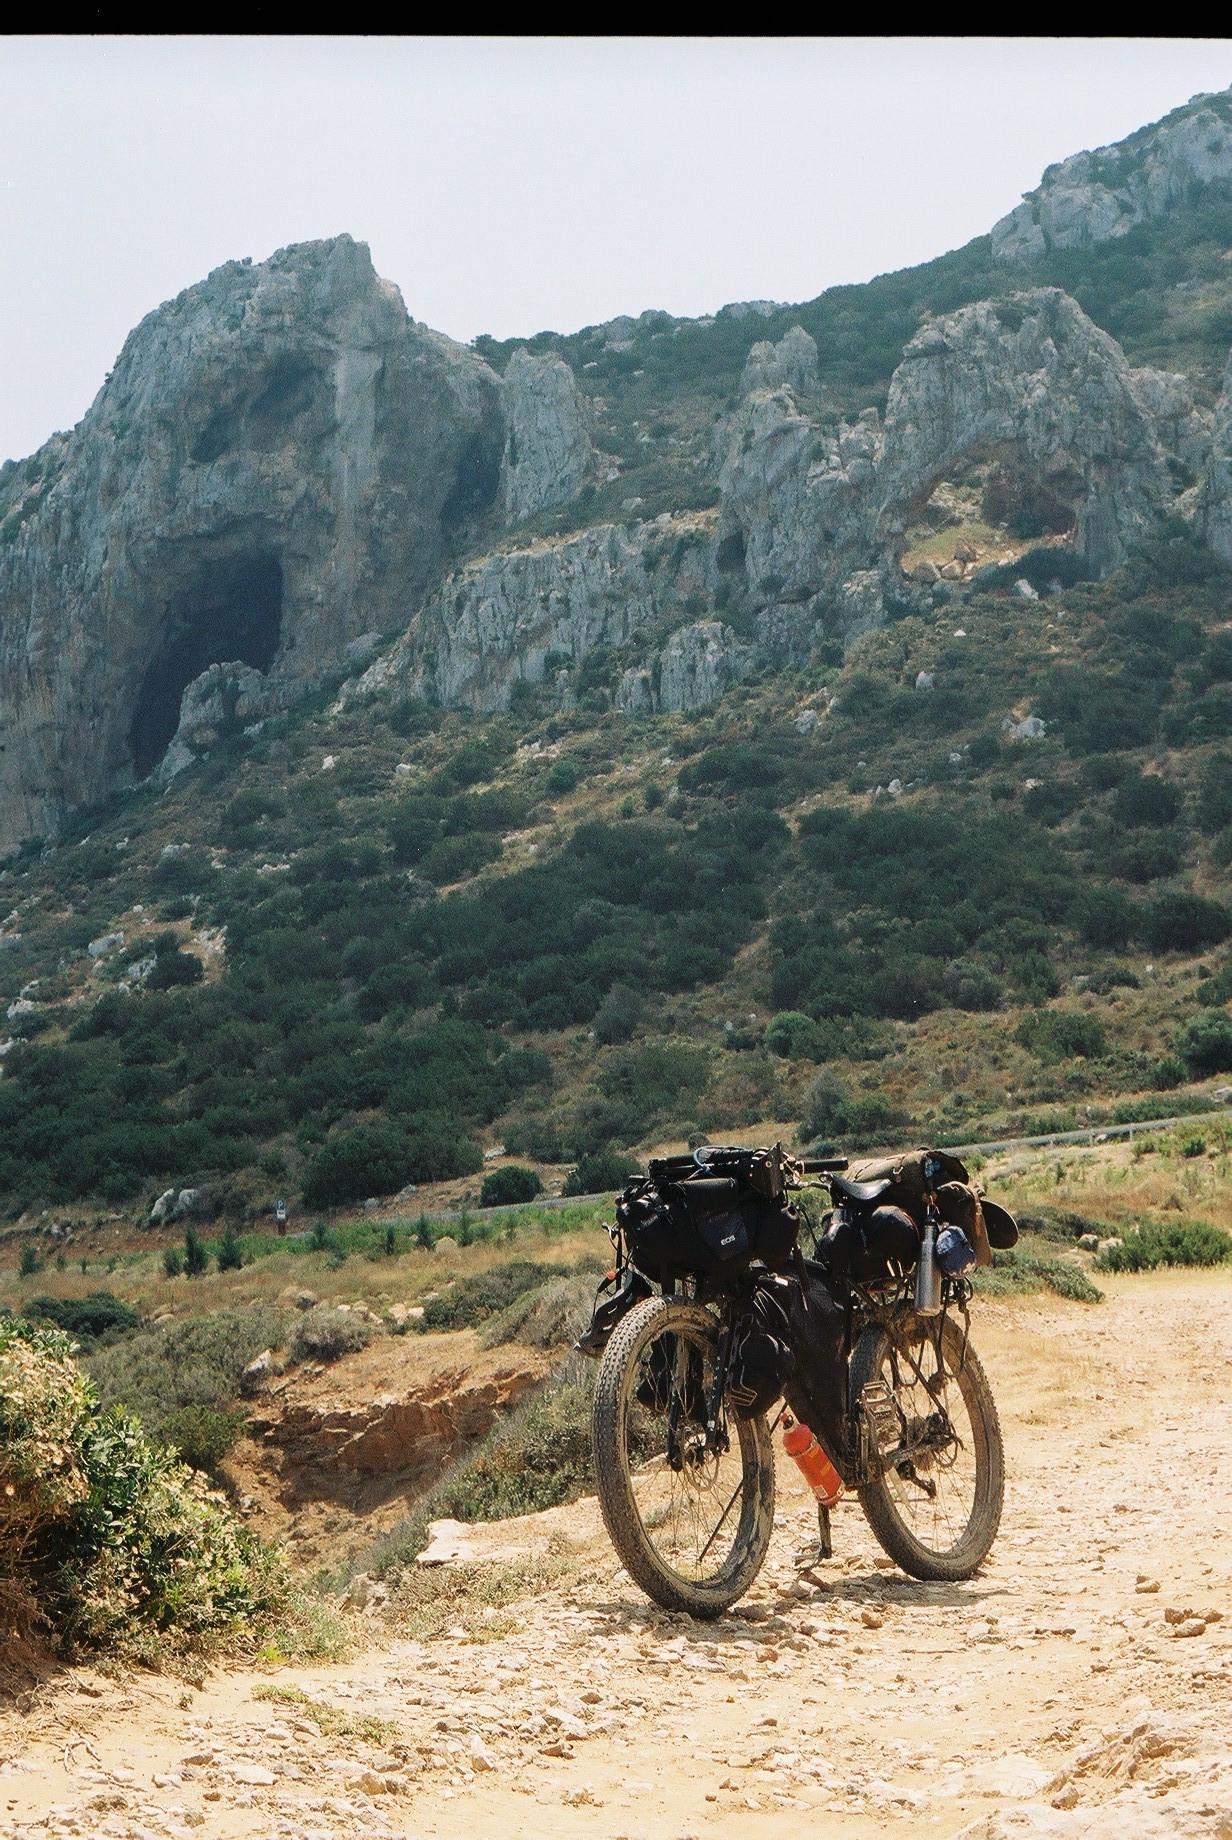 canon, canon ae1, bikepacking, bikepacking blog, bicycle touring, jack macgowan, sleeping bag, sleeping bag review, z packs, z packs review, lightweight sleeping bag, surly, surly bikes, surly ecr, bicycle touring apocalypse